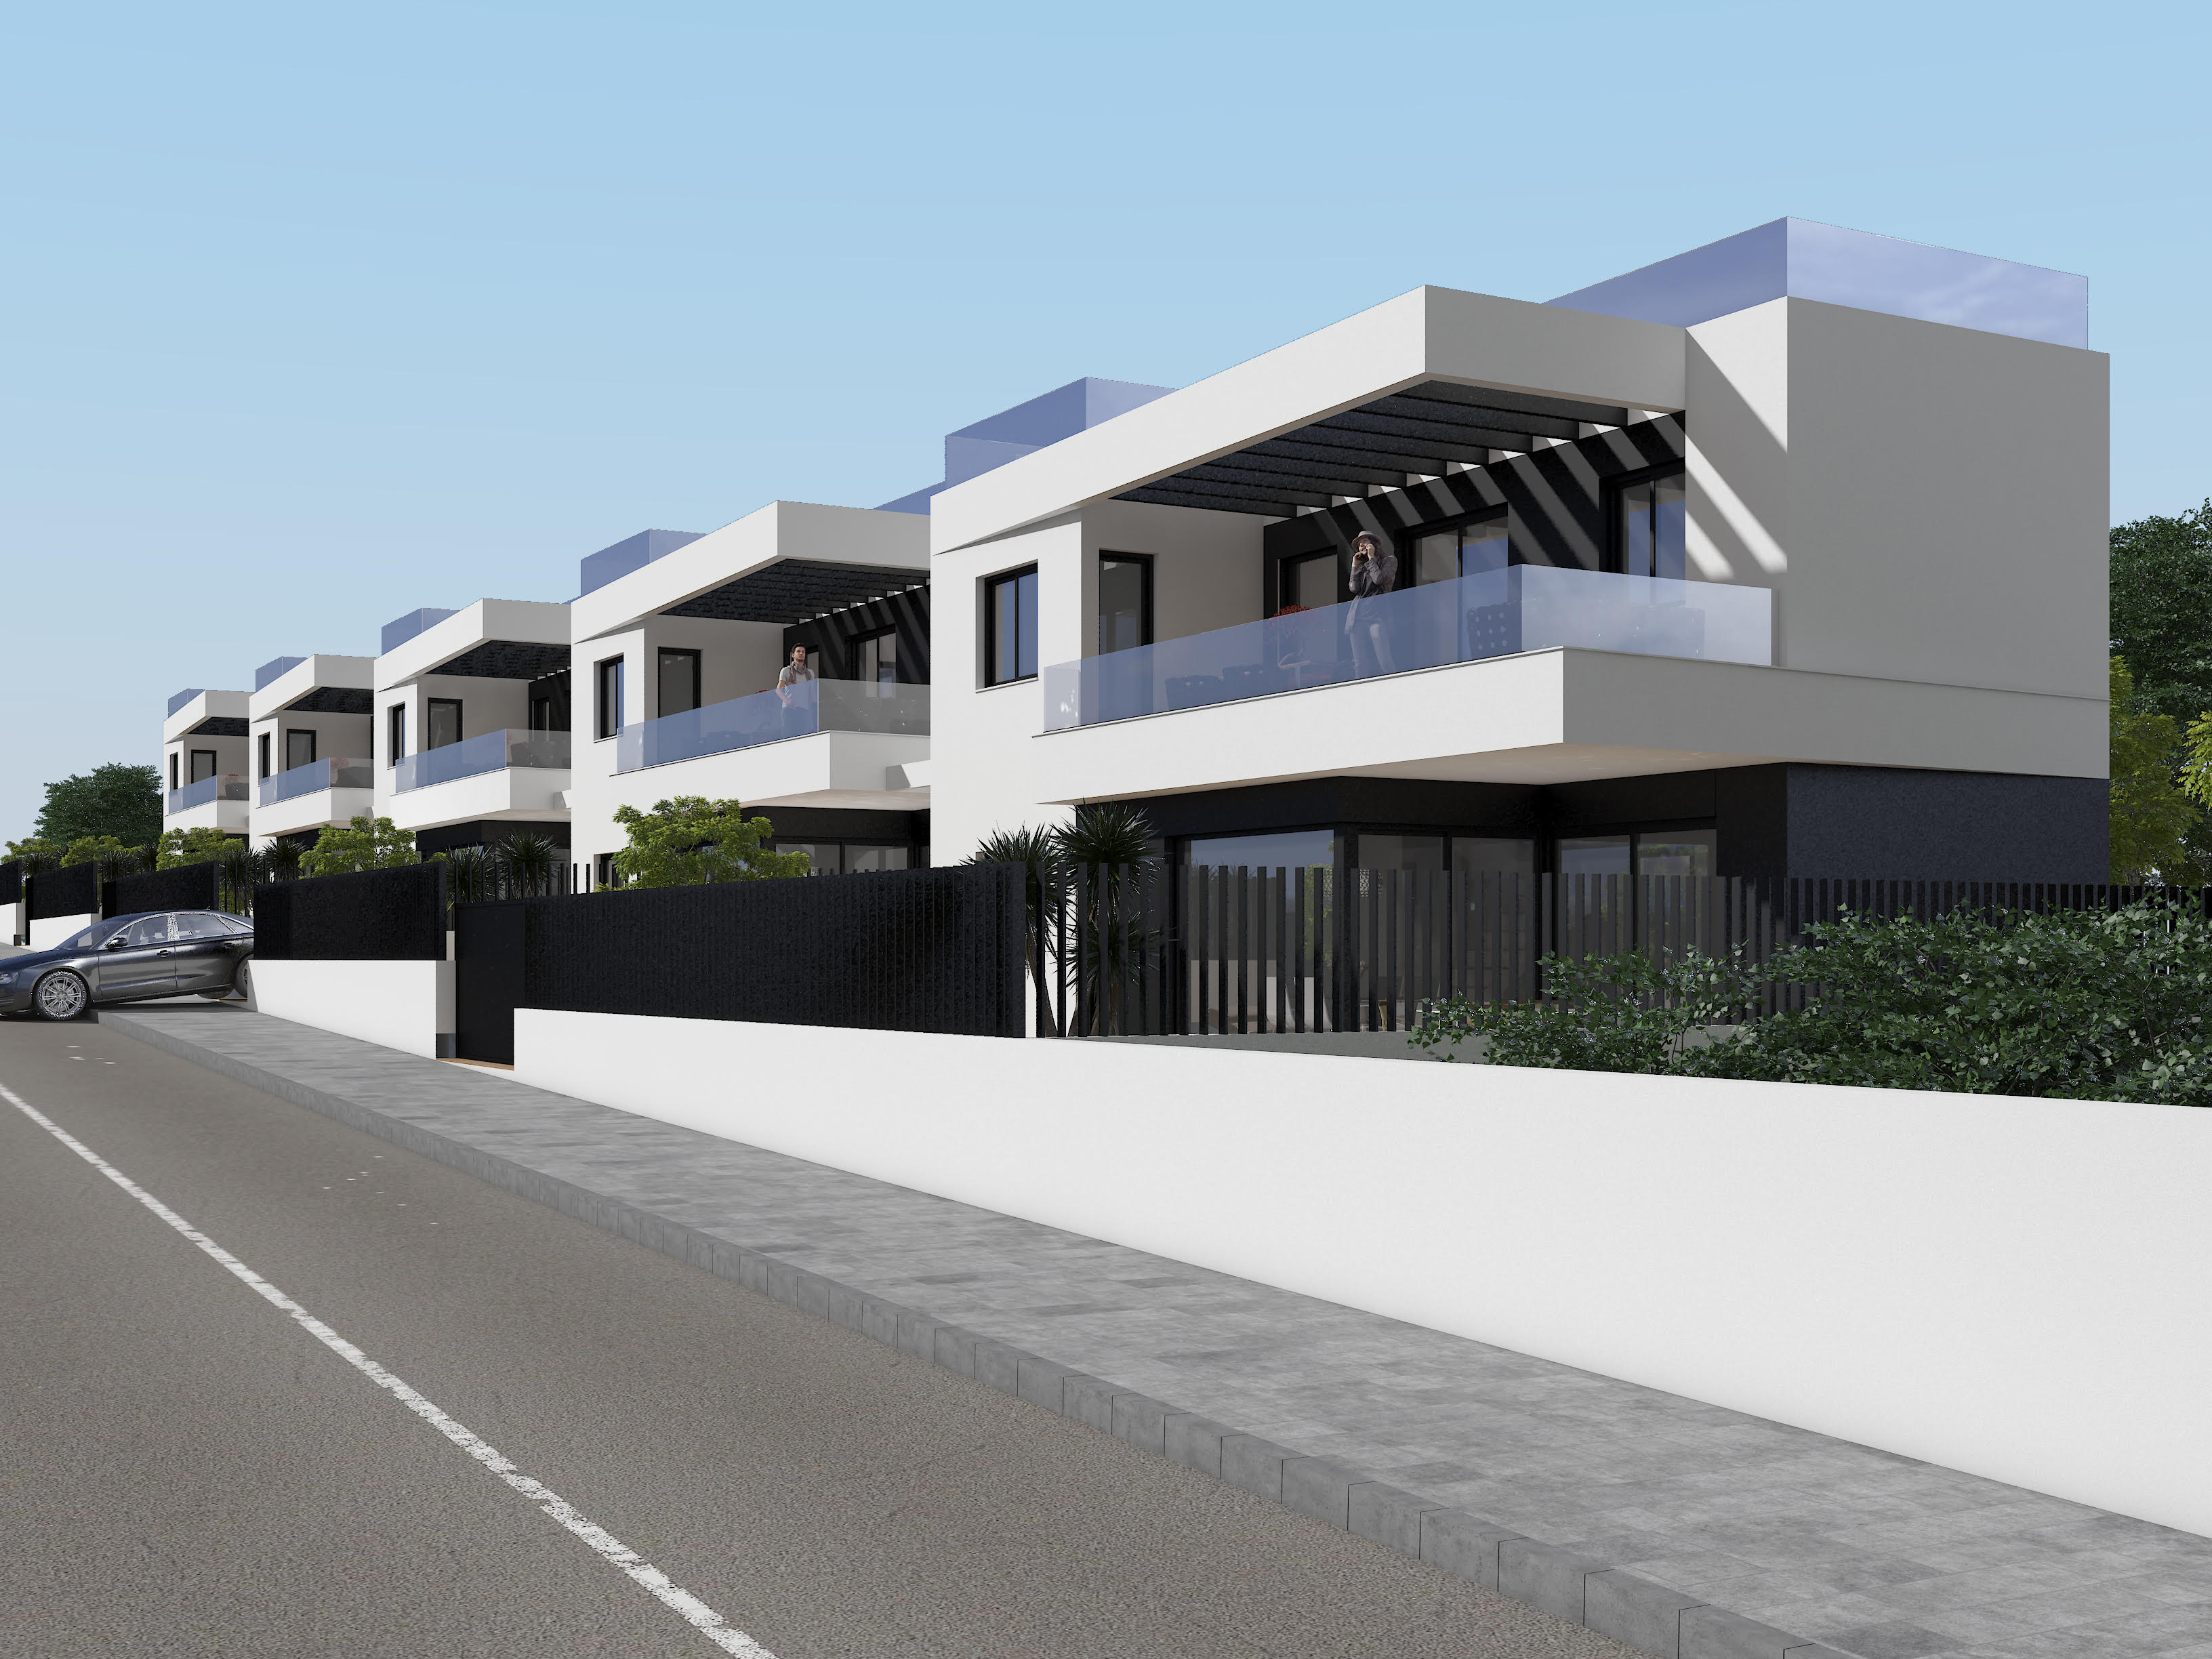 kf942362: Villa for sale in Villamartin